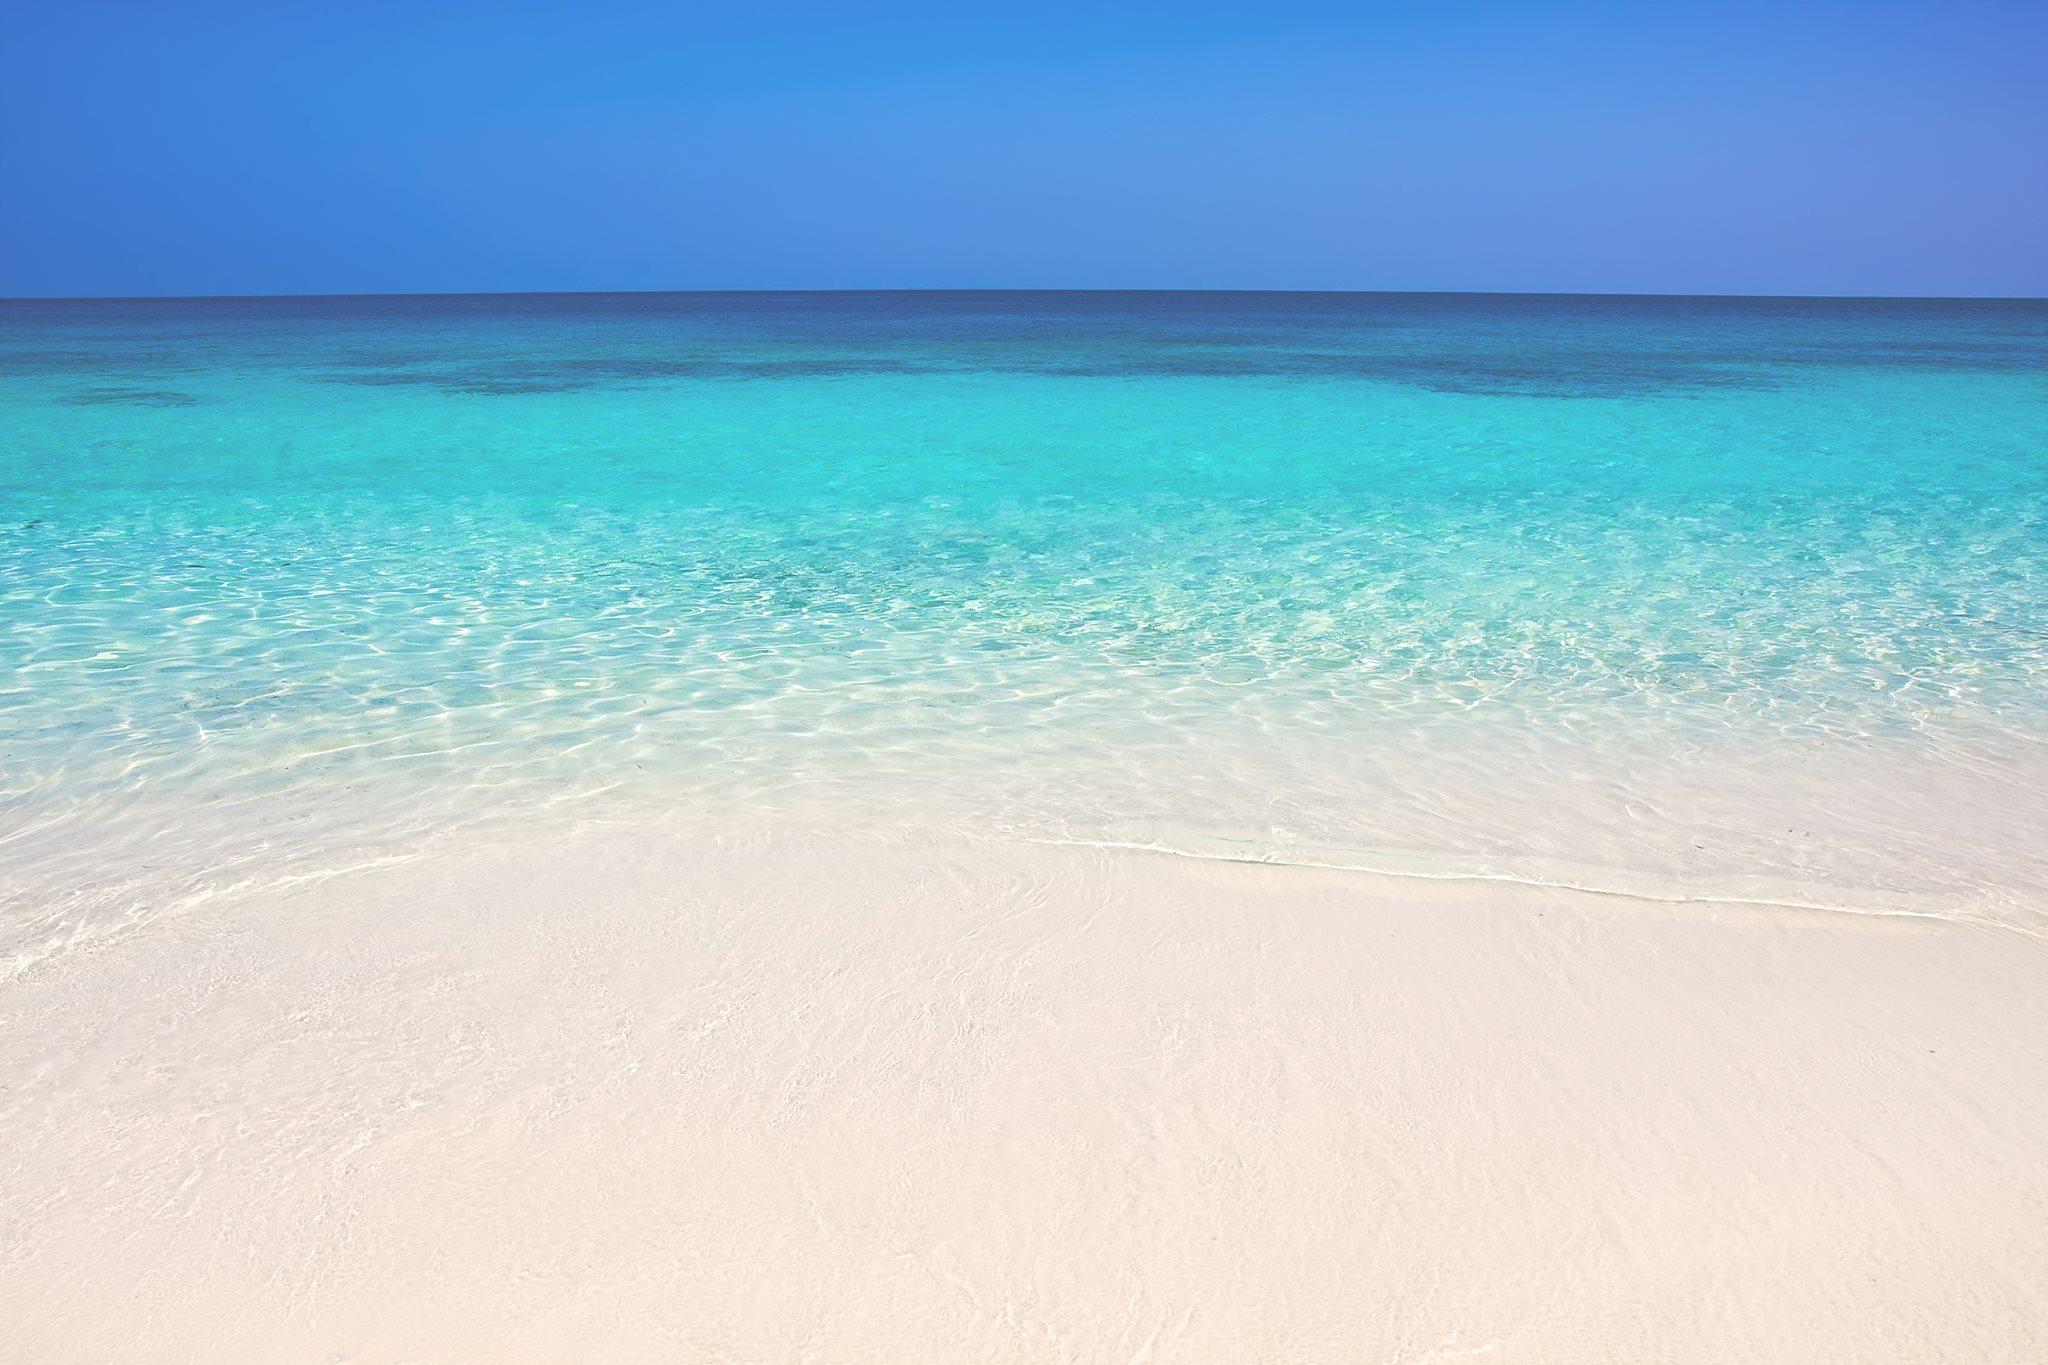 Seven+Mile+Beach_Cayman+Islands.jpg